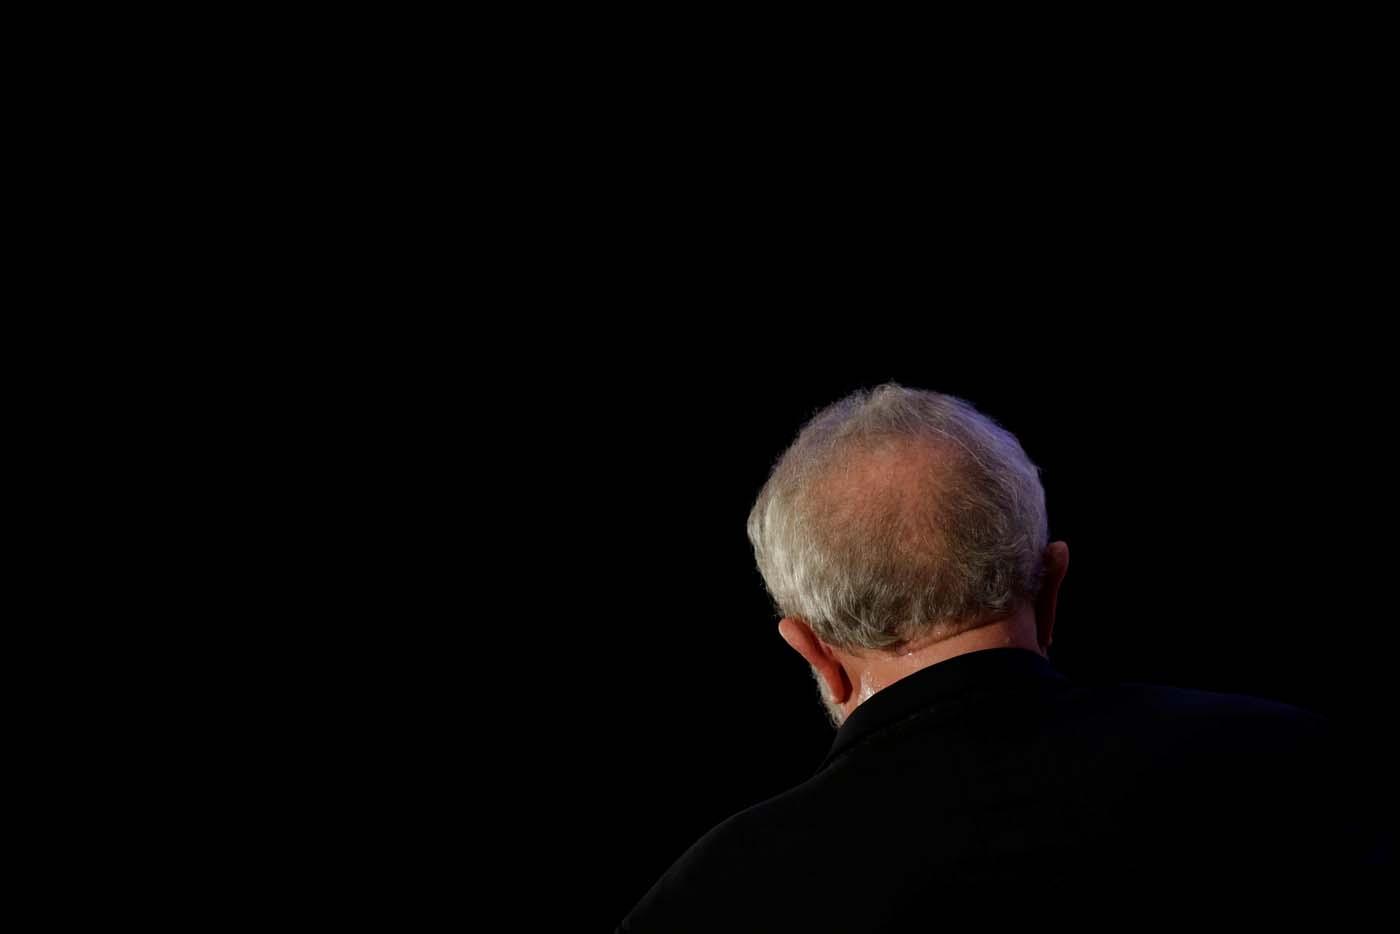 Former Brazil's President Luiz Inacio Lula da Silva gestures during a national congress of Communist Party of Brazil in Brasilia, Brazil, November 19, 2017. REUTERS/Ueslei Marcelino